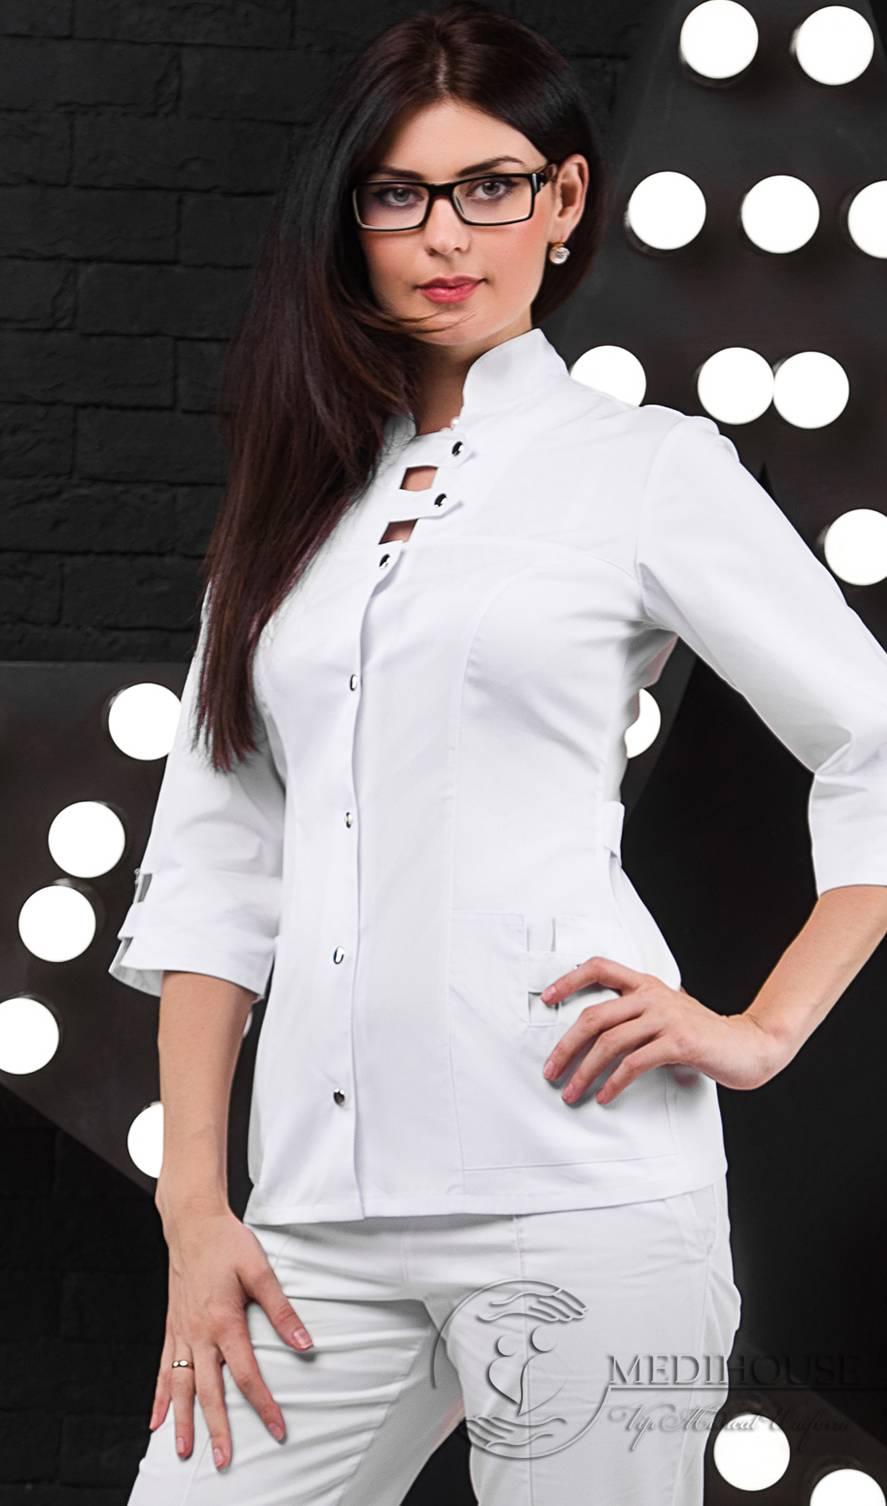 Женский медицинский блузон мод. 1.0.1 White